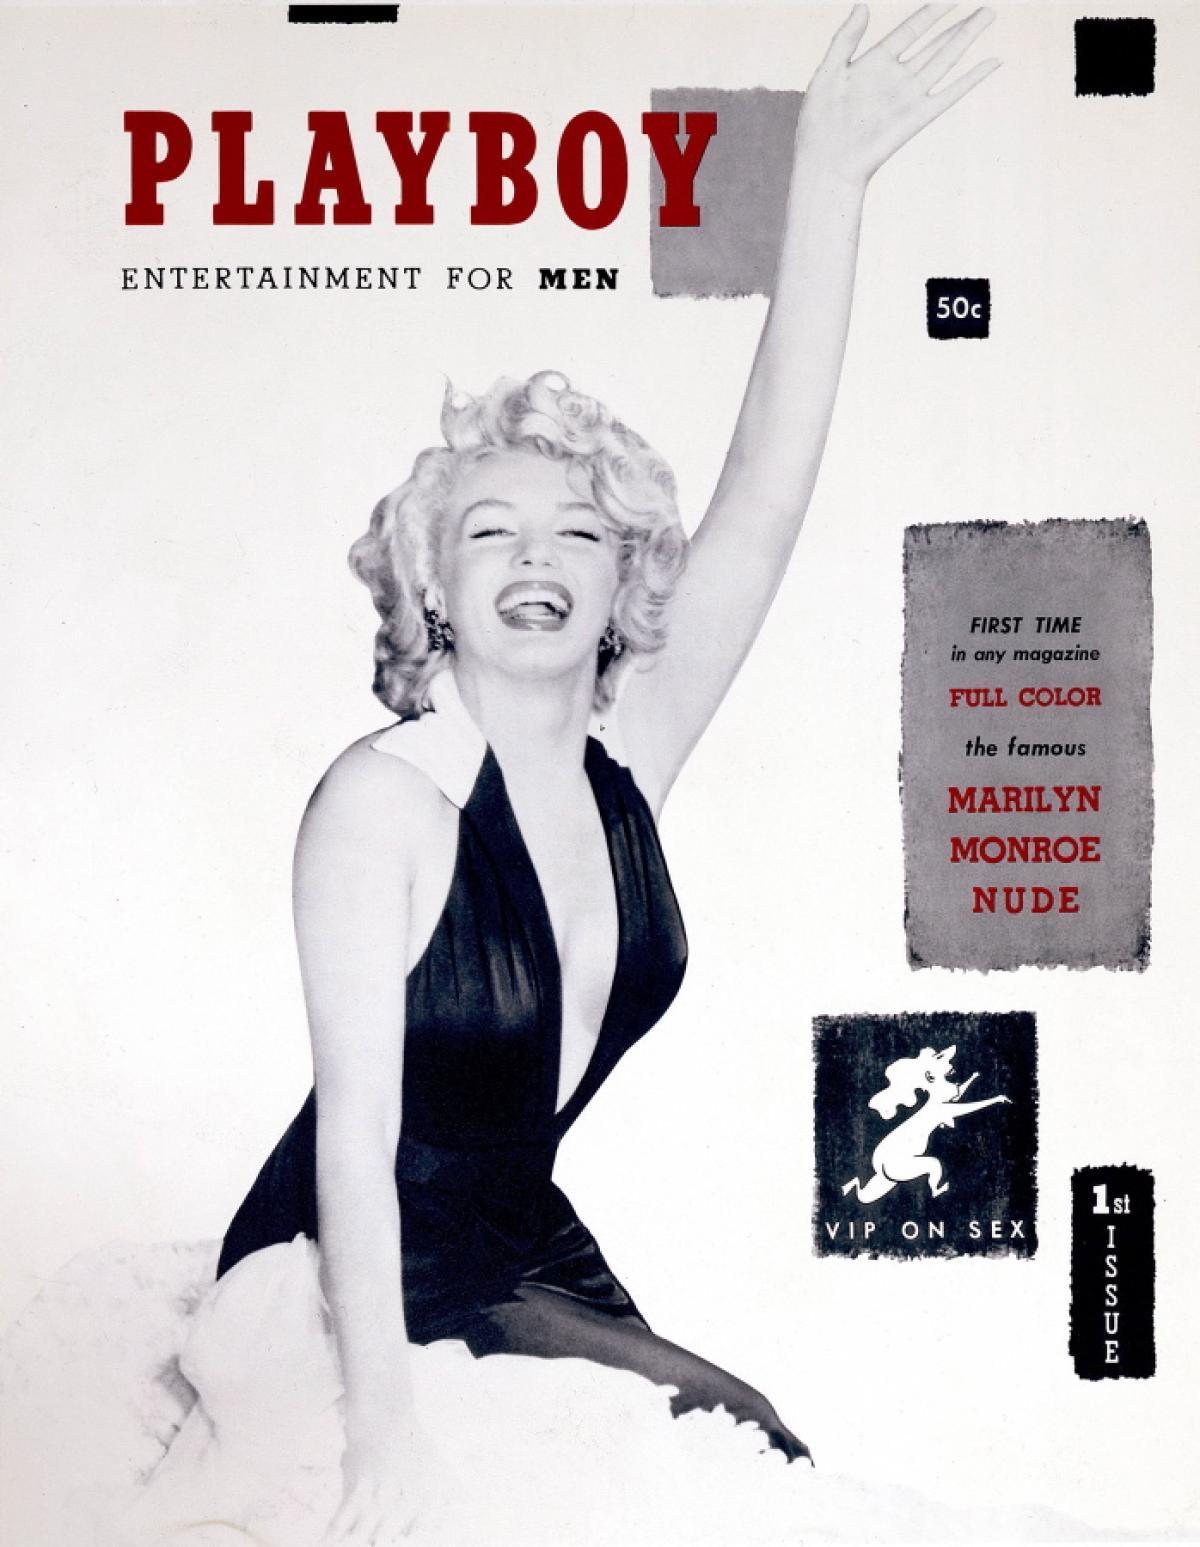 Playboy first edition